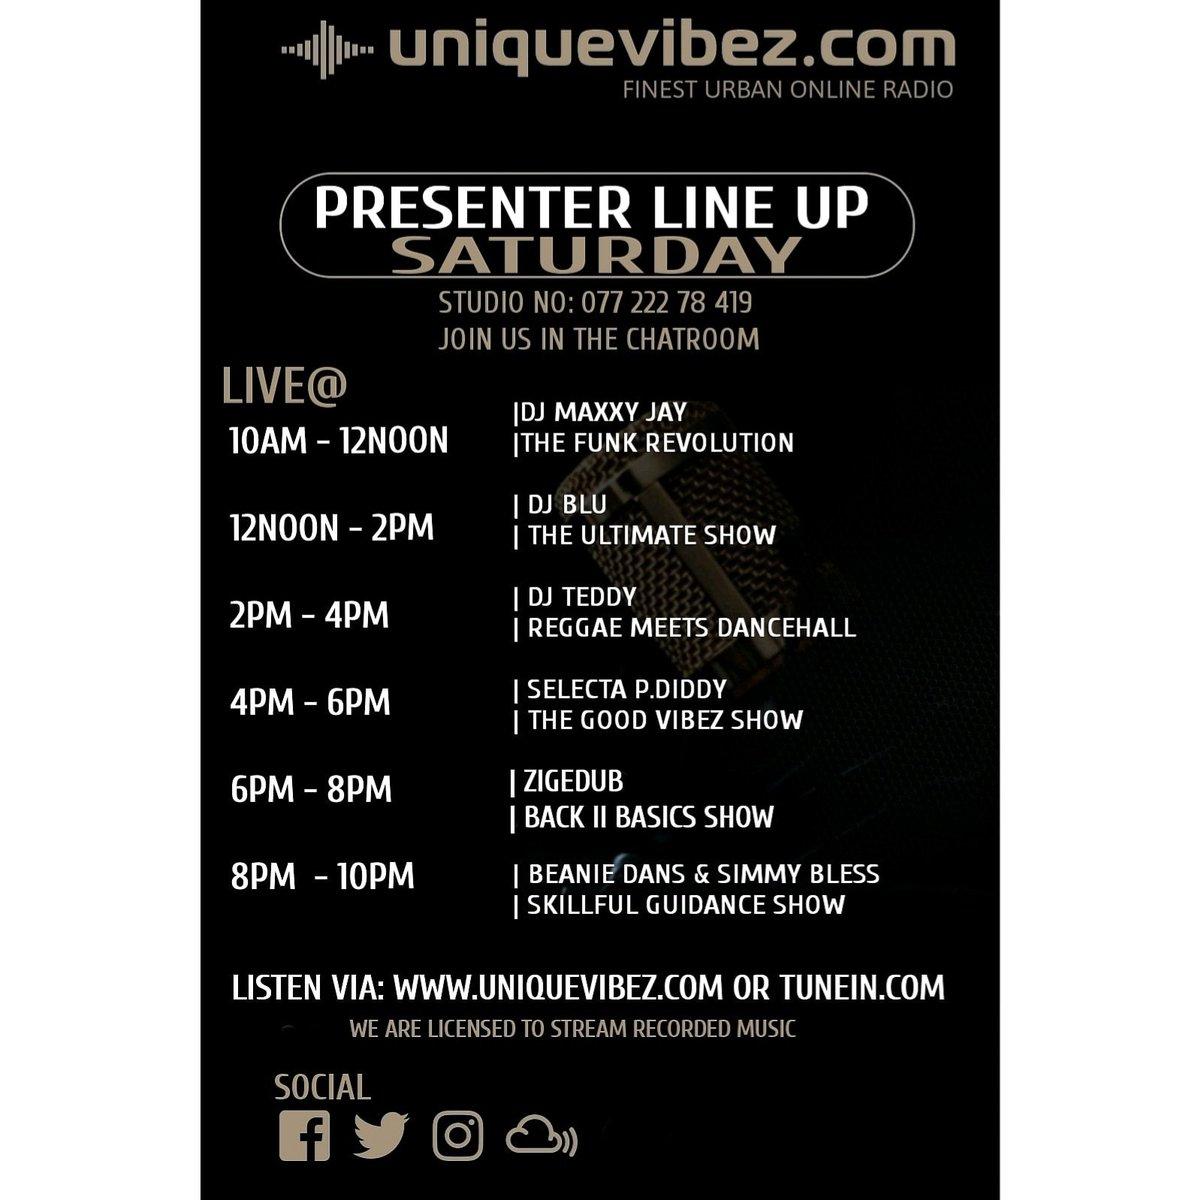 #saturday from 10am #bst on http://uniquevibez.com #funk #soul #neosoul #afrobeats #rnb #reggae #reggaerevival #dancehall #bashment #reggaevocals #hiphop #oldskool #nuskool and more  #internetradio  #vibes  #onlineradio  #entertainnent  #djs  #radiopresenters  #radio